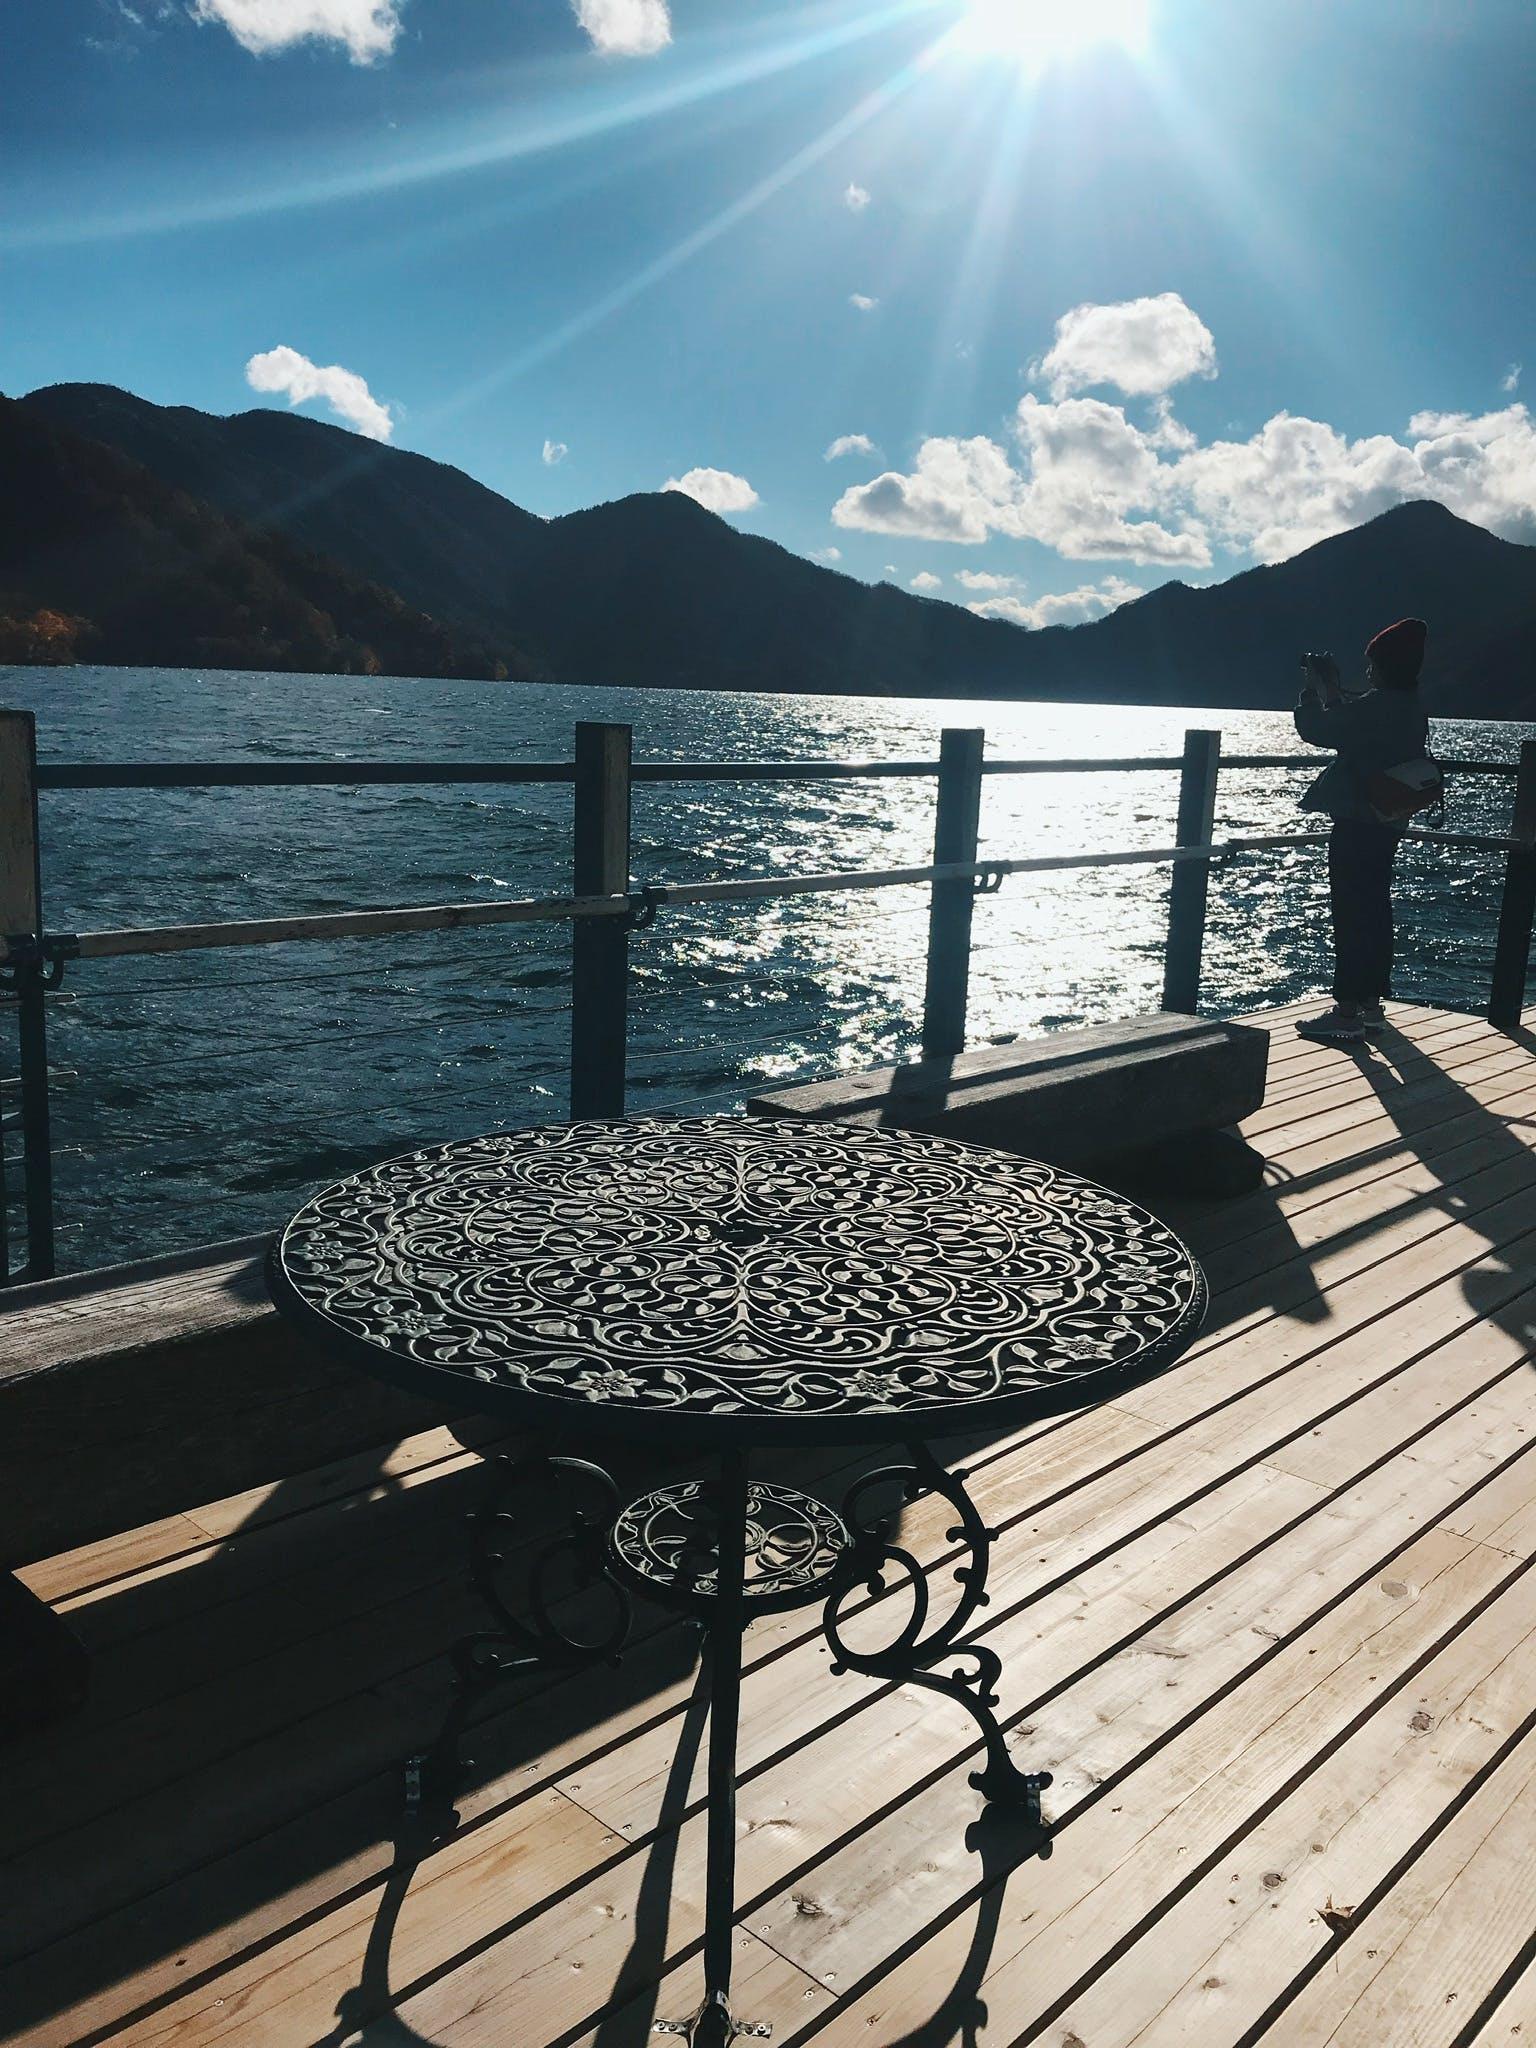 Free stock photo of #autum #japan #nikko #natural #beautyful, #harbour #season